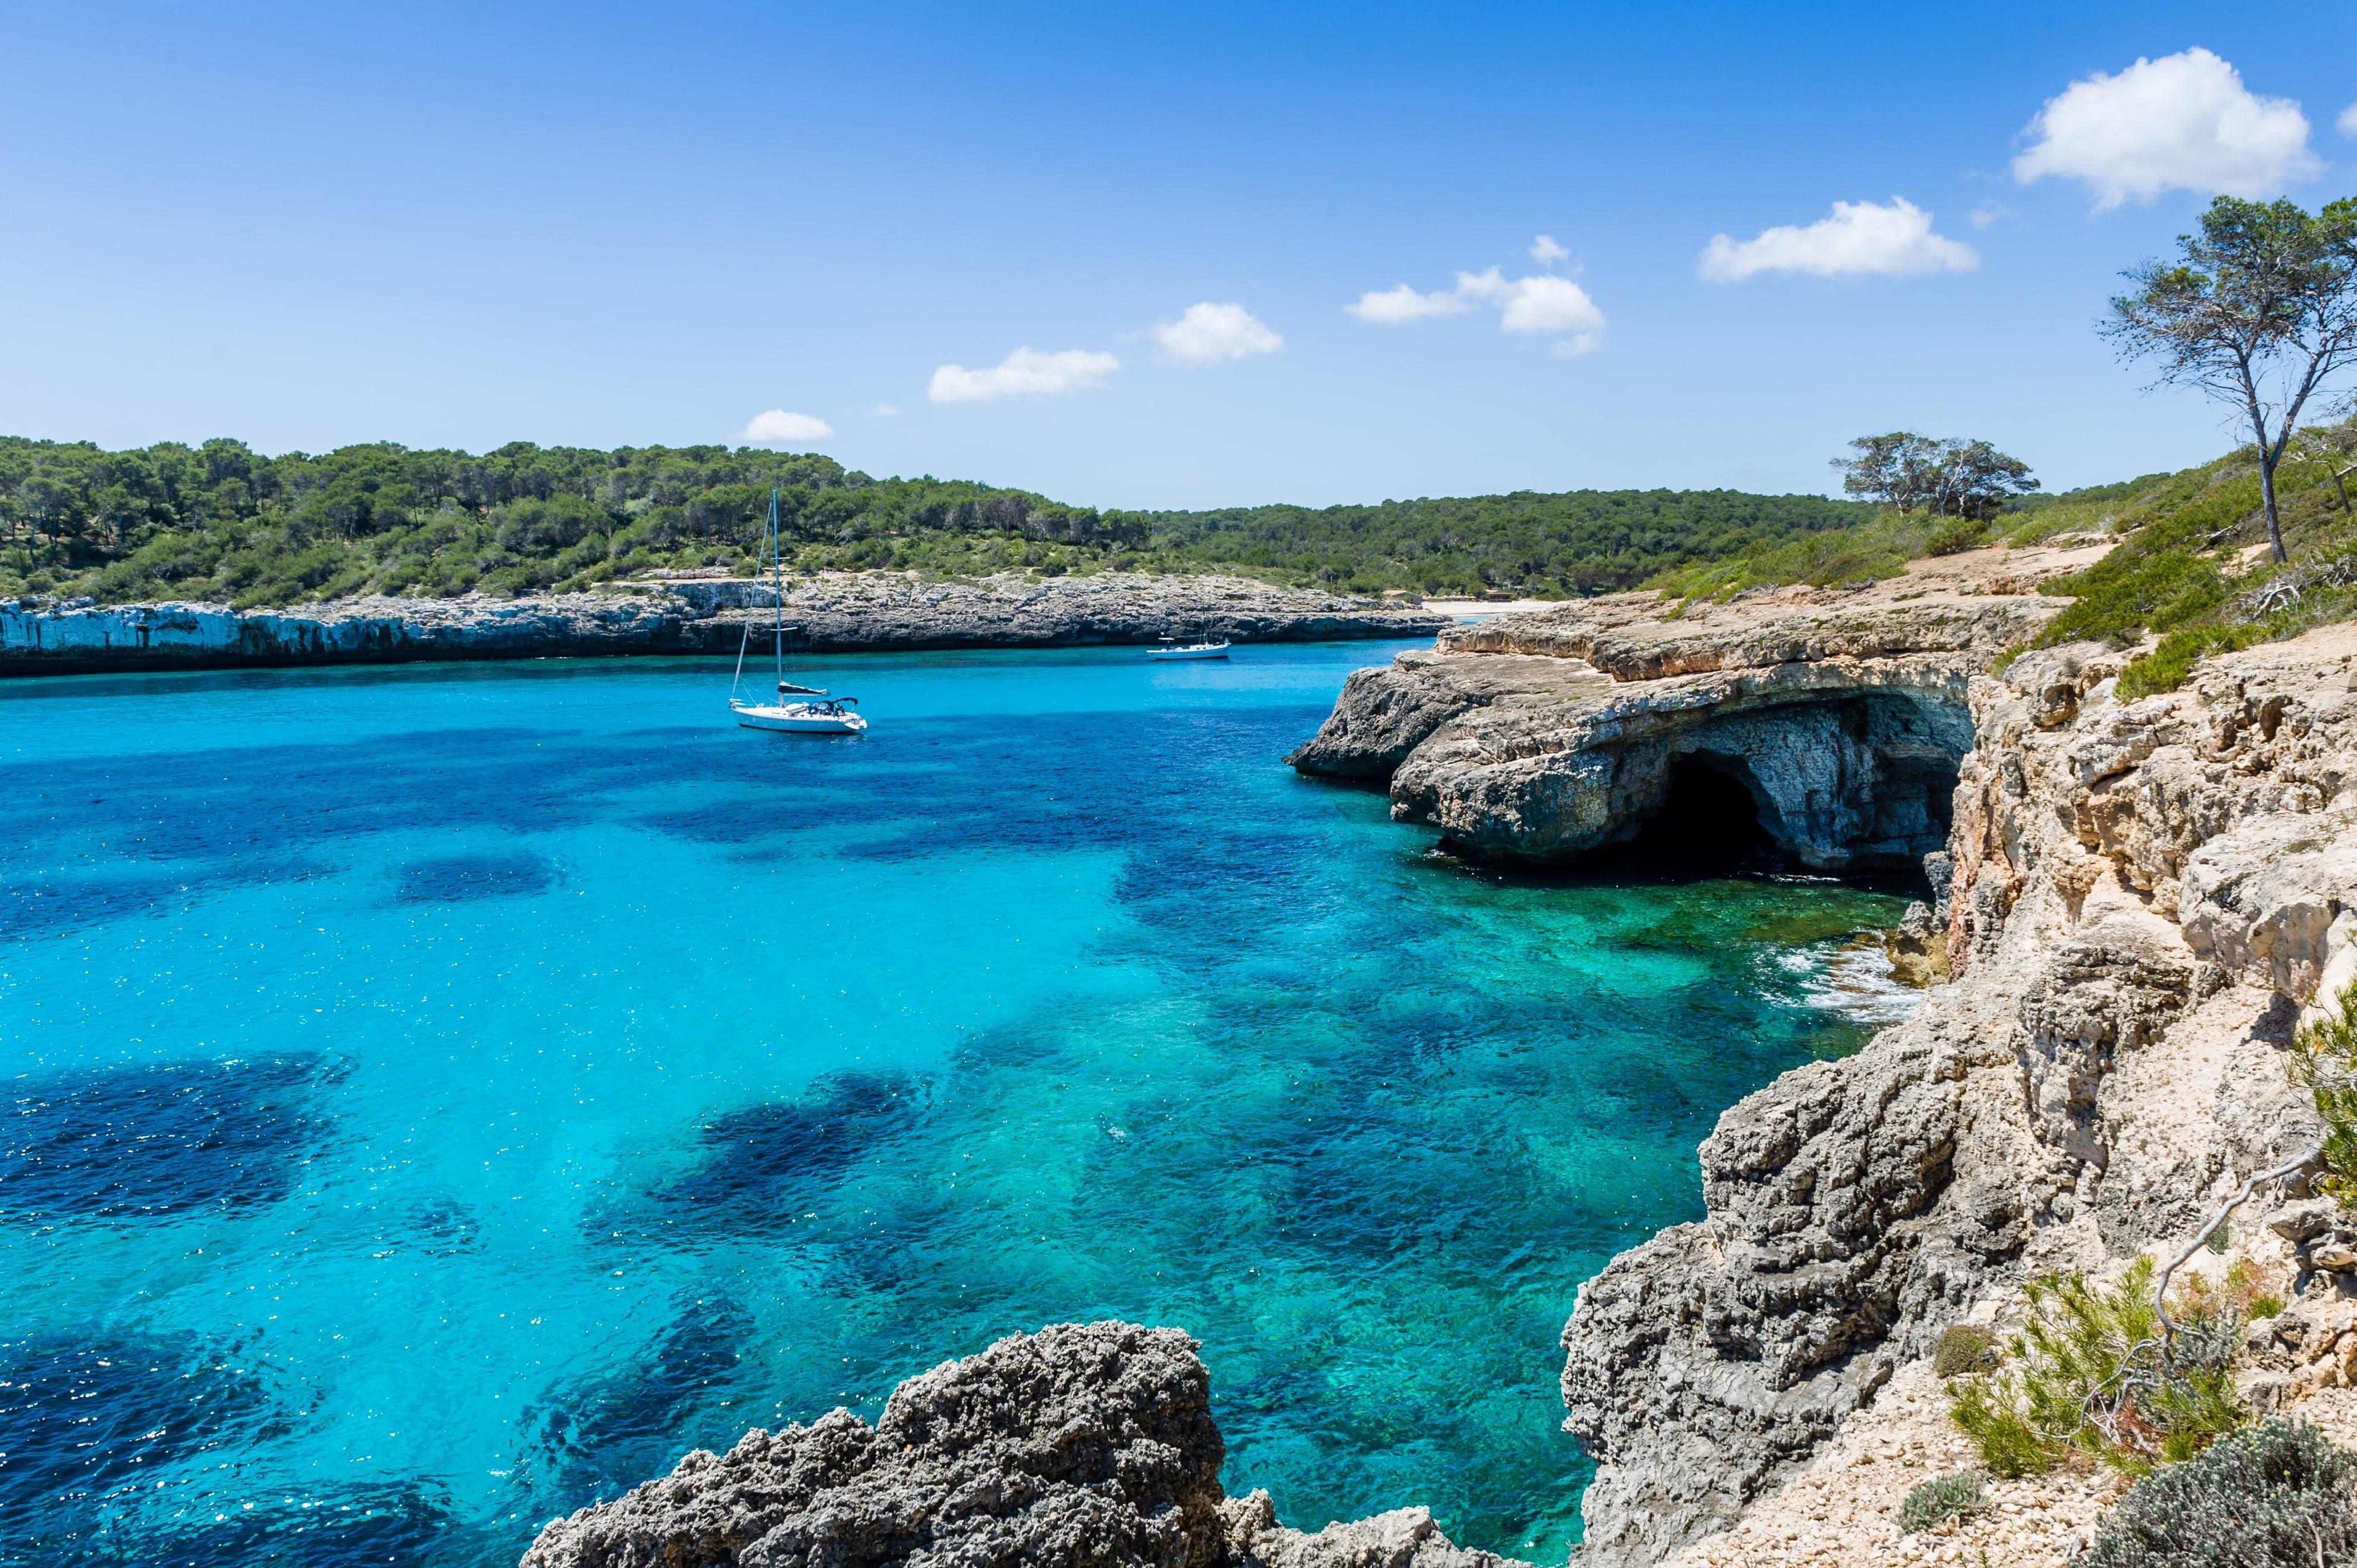 balearic-islands-yacht-charter-minorca-majorca-cabrera-sailing-itinerary-route